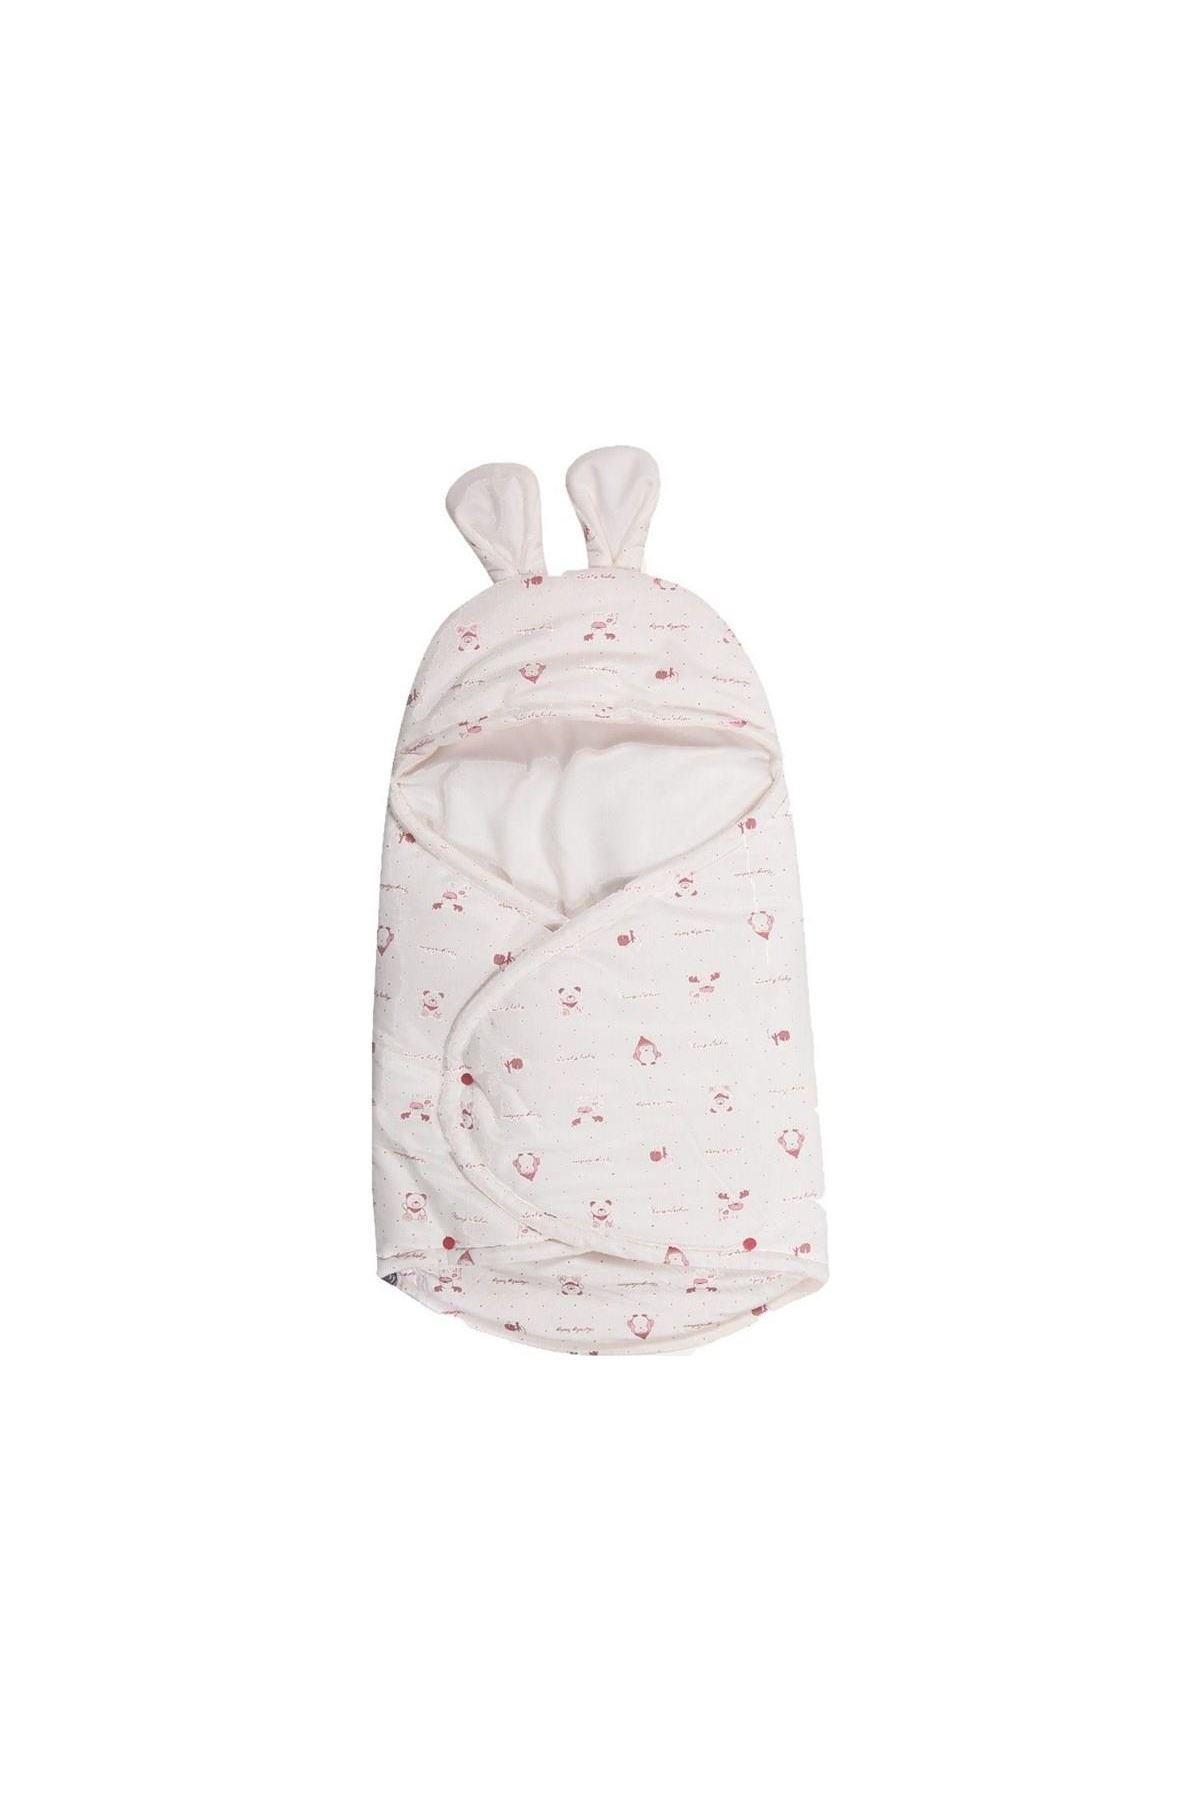 Bibaby Scoop Kız Bebek Kundak 81000 Pembe